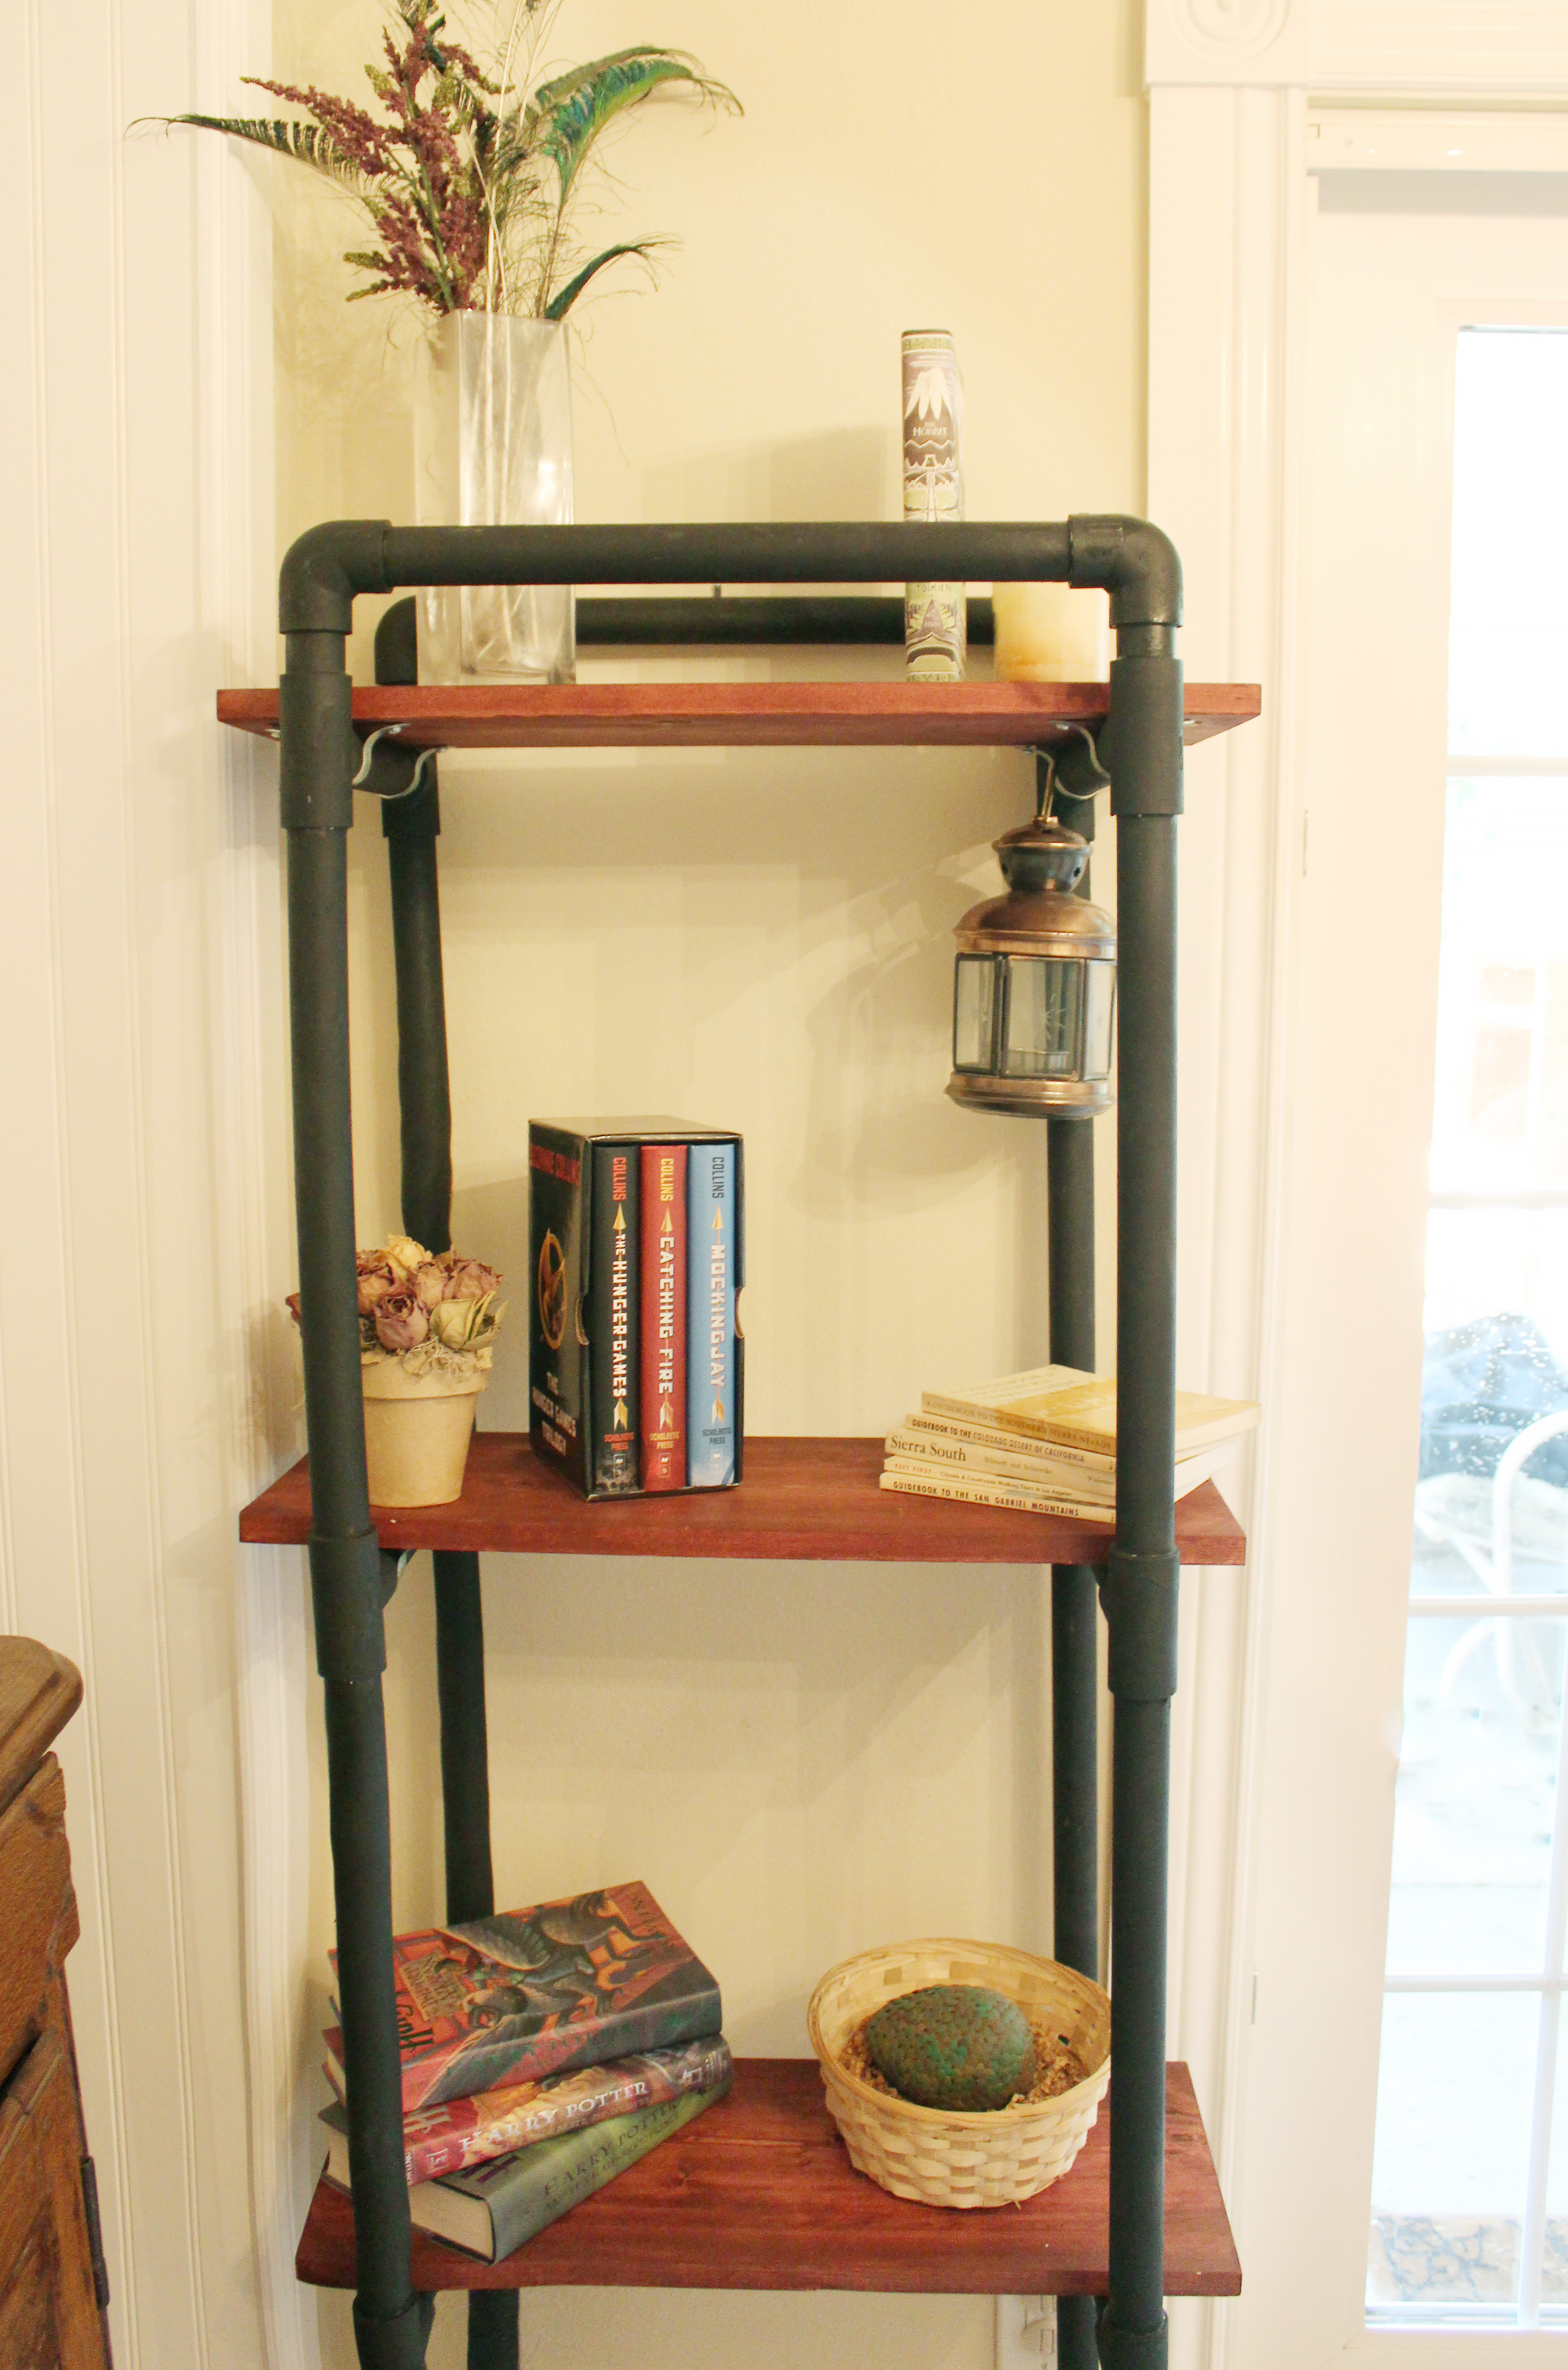 How to Make PVC Book Shelves | eHow